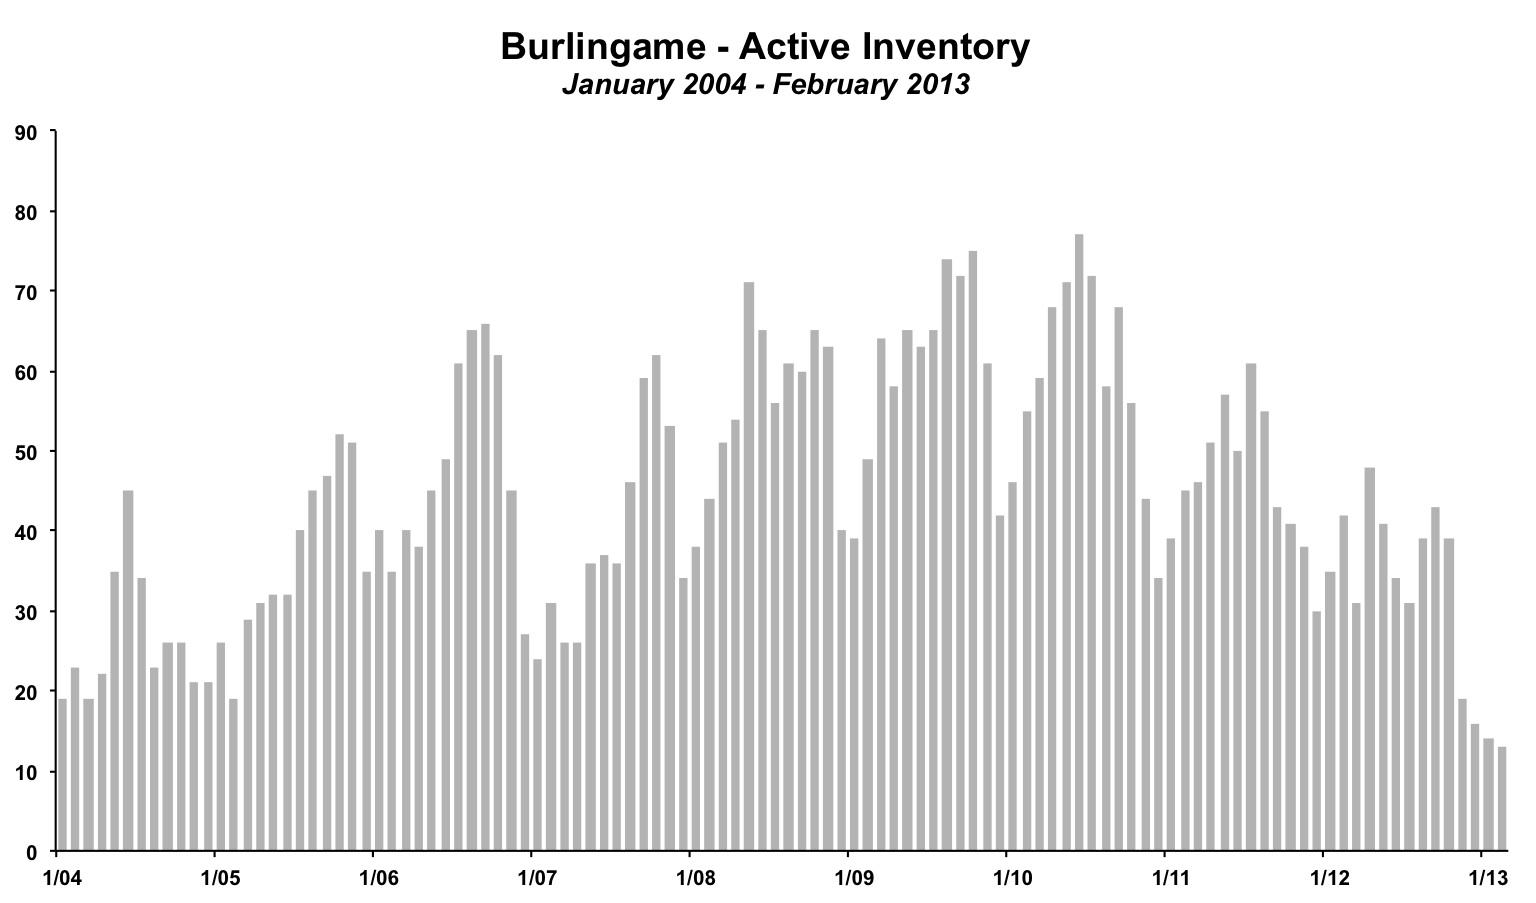 Burlingame Inventory February 2013